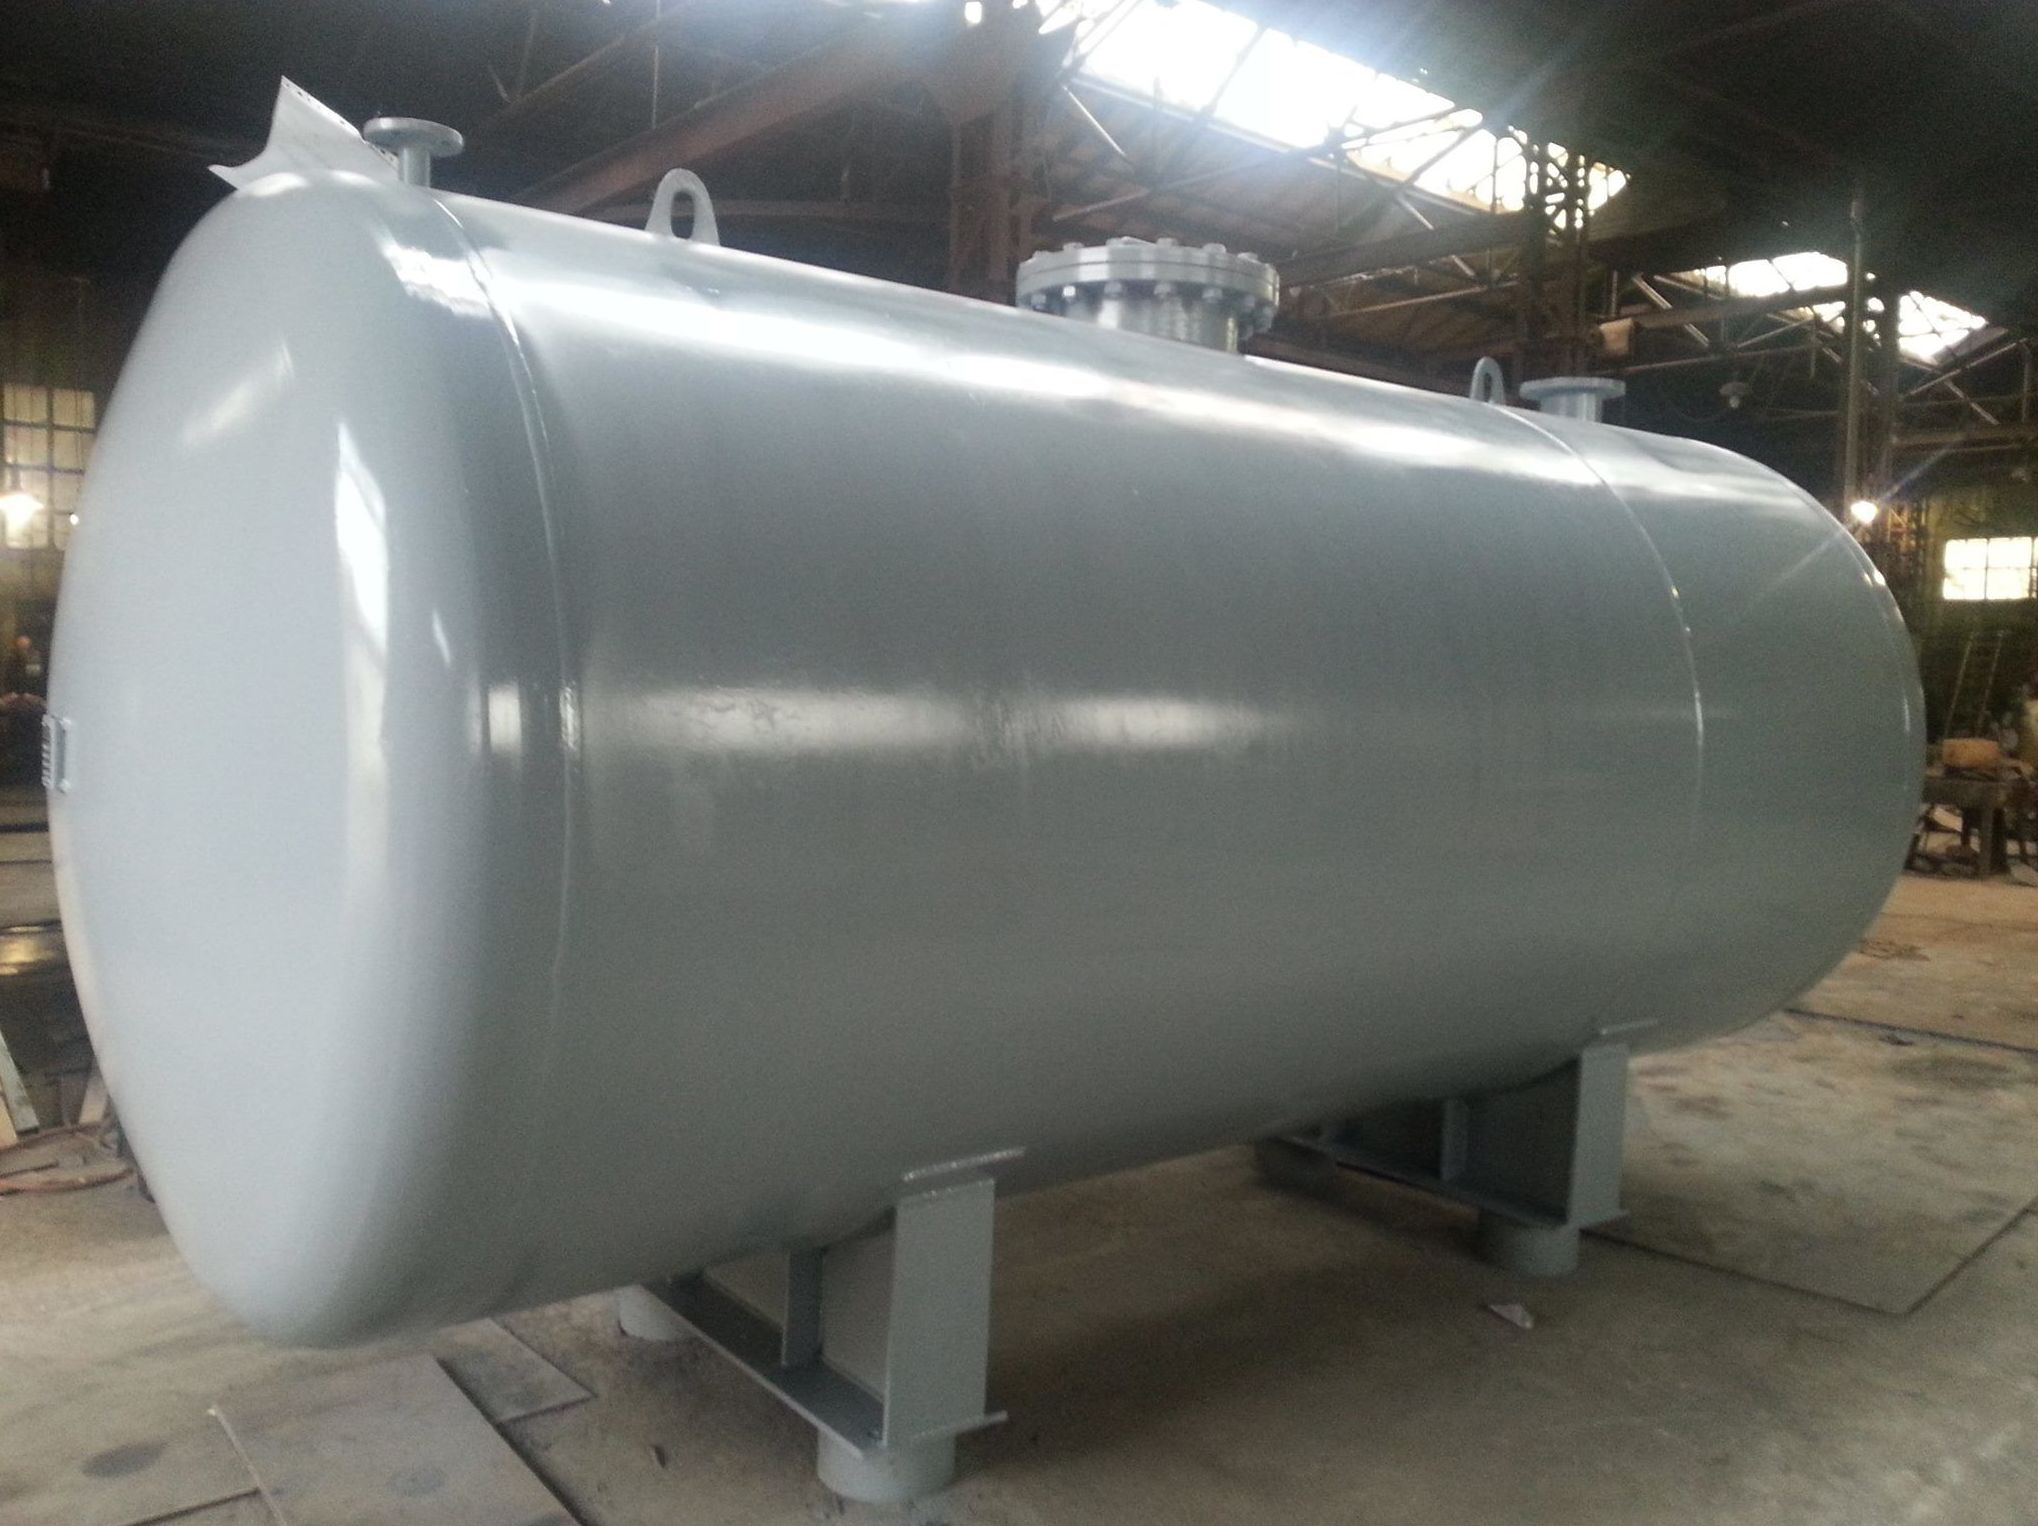 Depósito 10000 litros